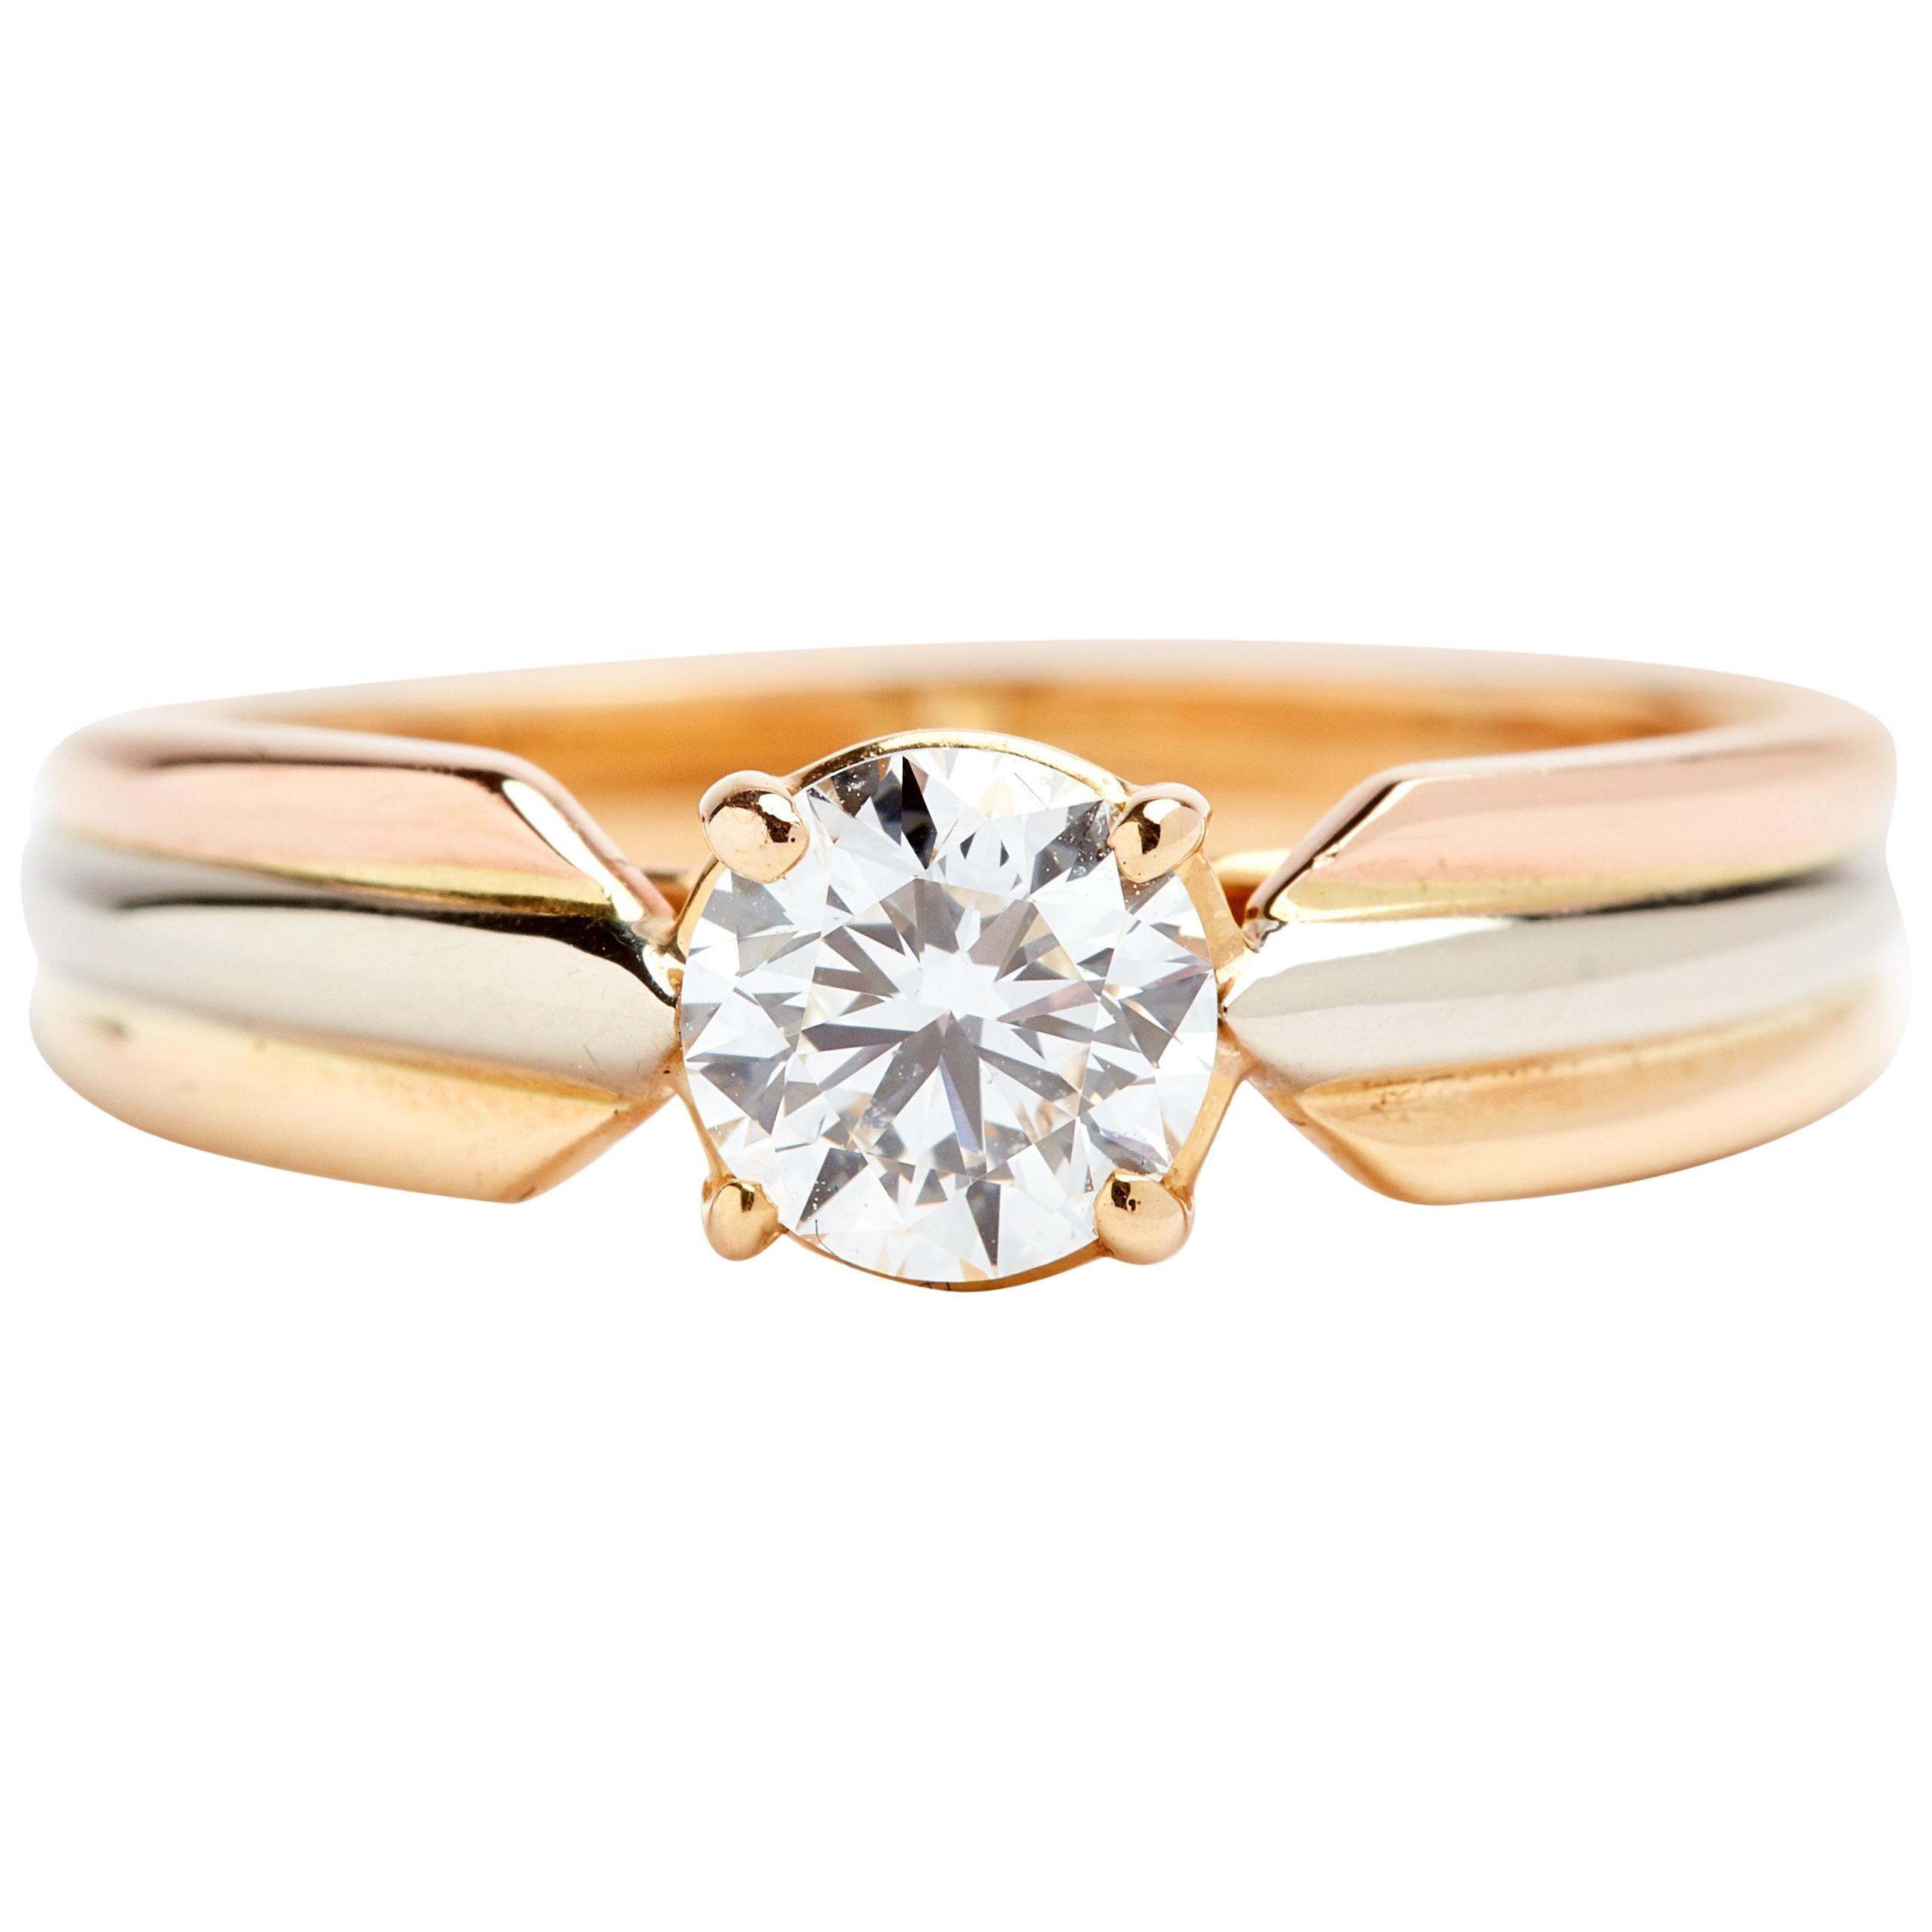 81df560cd6584 Tri-Tone 18 Karat Gold Cartier Solitaire Engagement Ring